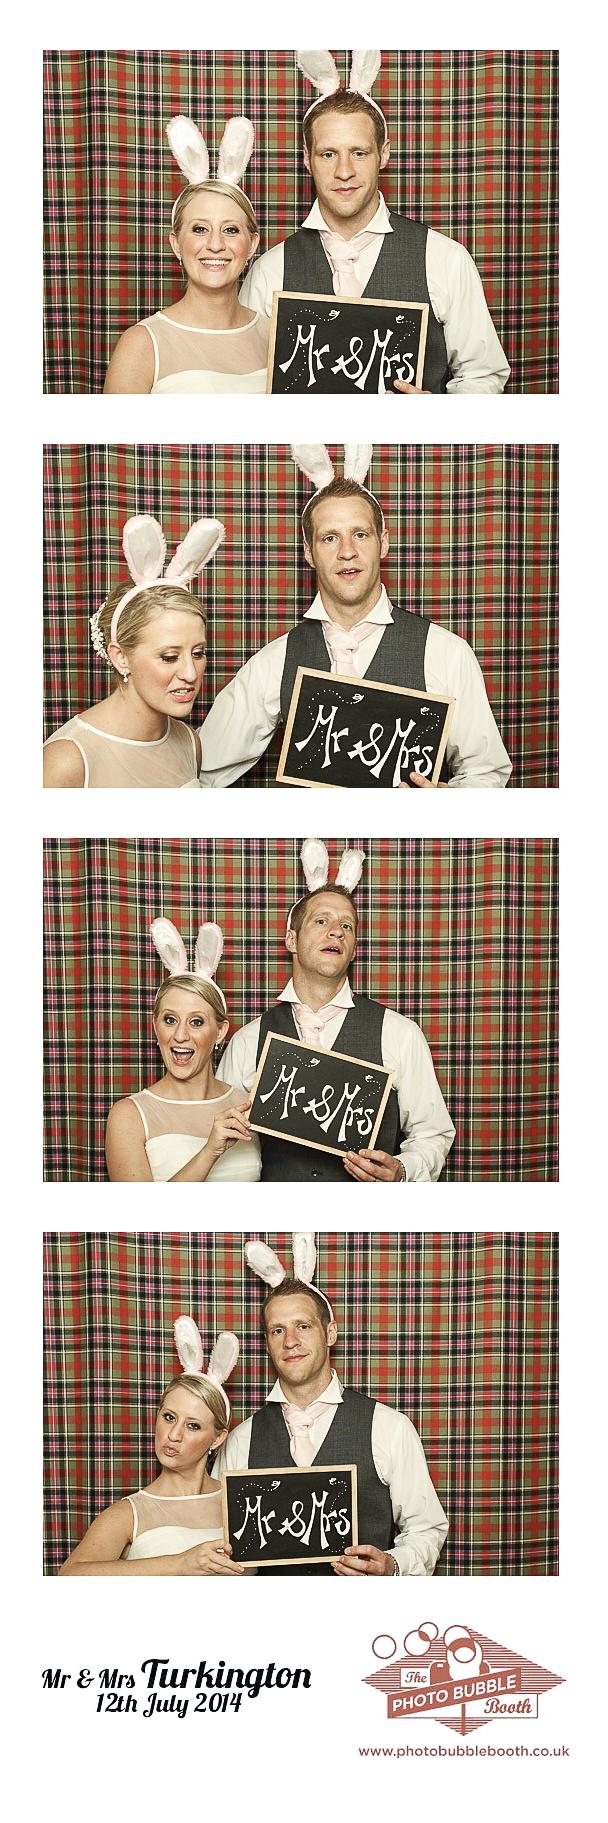 Mr & Mrs Turkington Photobooth _14.JPG